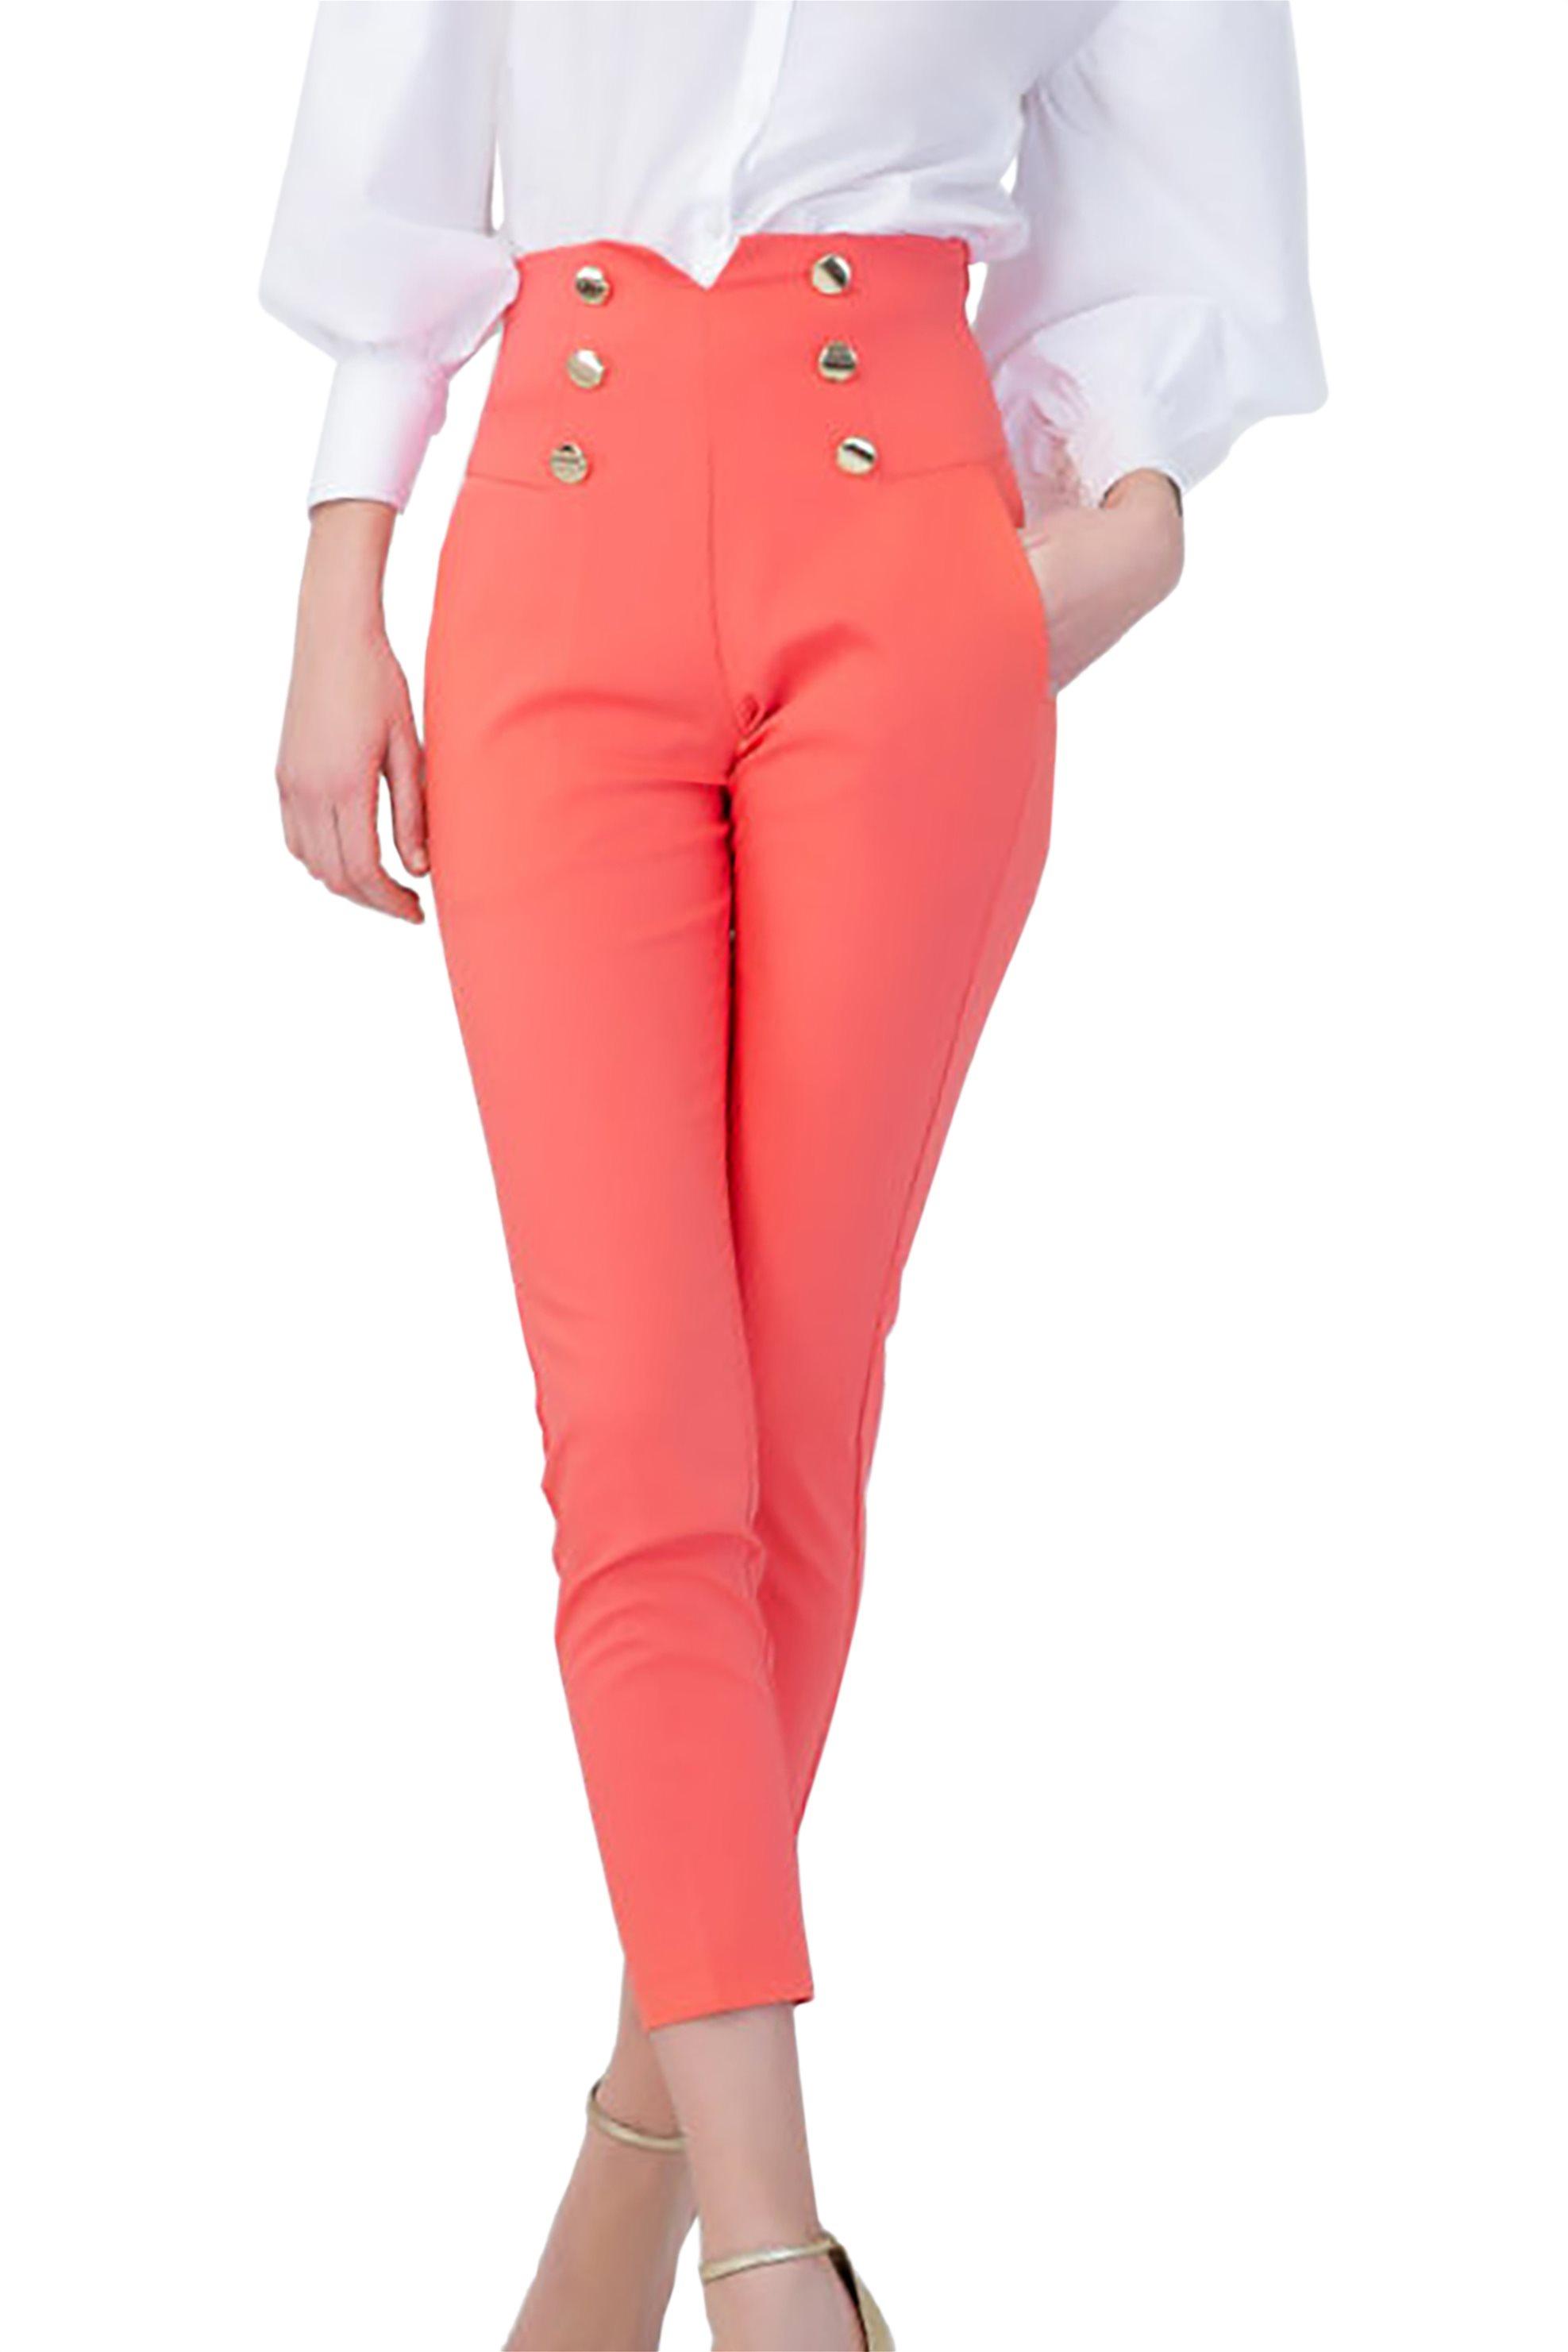 Billy Sabbado γυναικείο παντελόνι ψηλόμεσο με χρυσά κουμπιά - 292486286 - Κοραλί γυναικα   ρουχα   παντελόνια   cropped